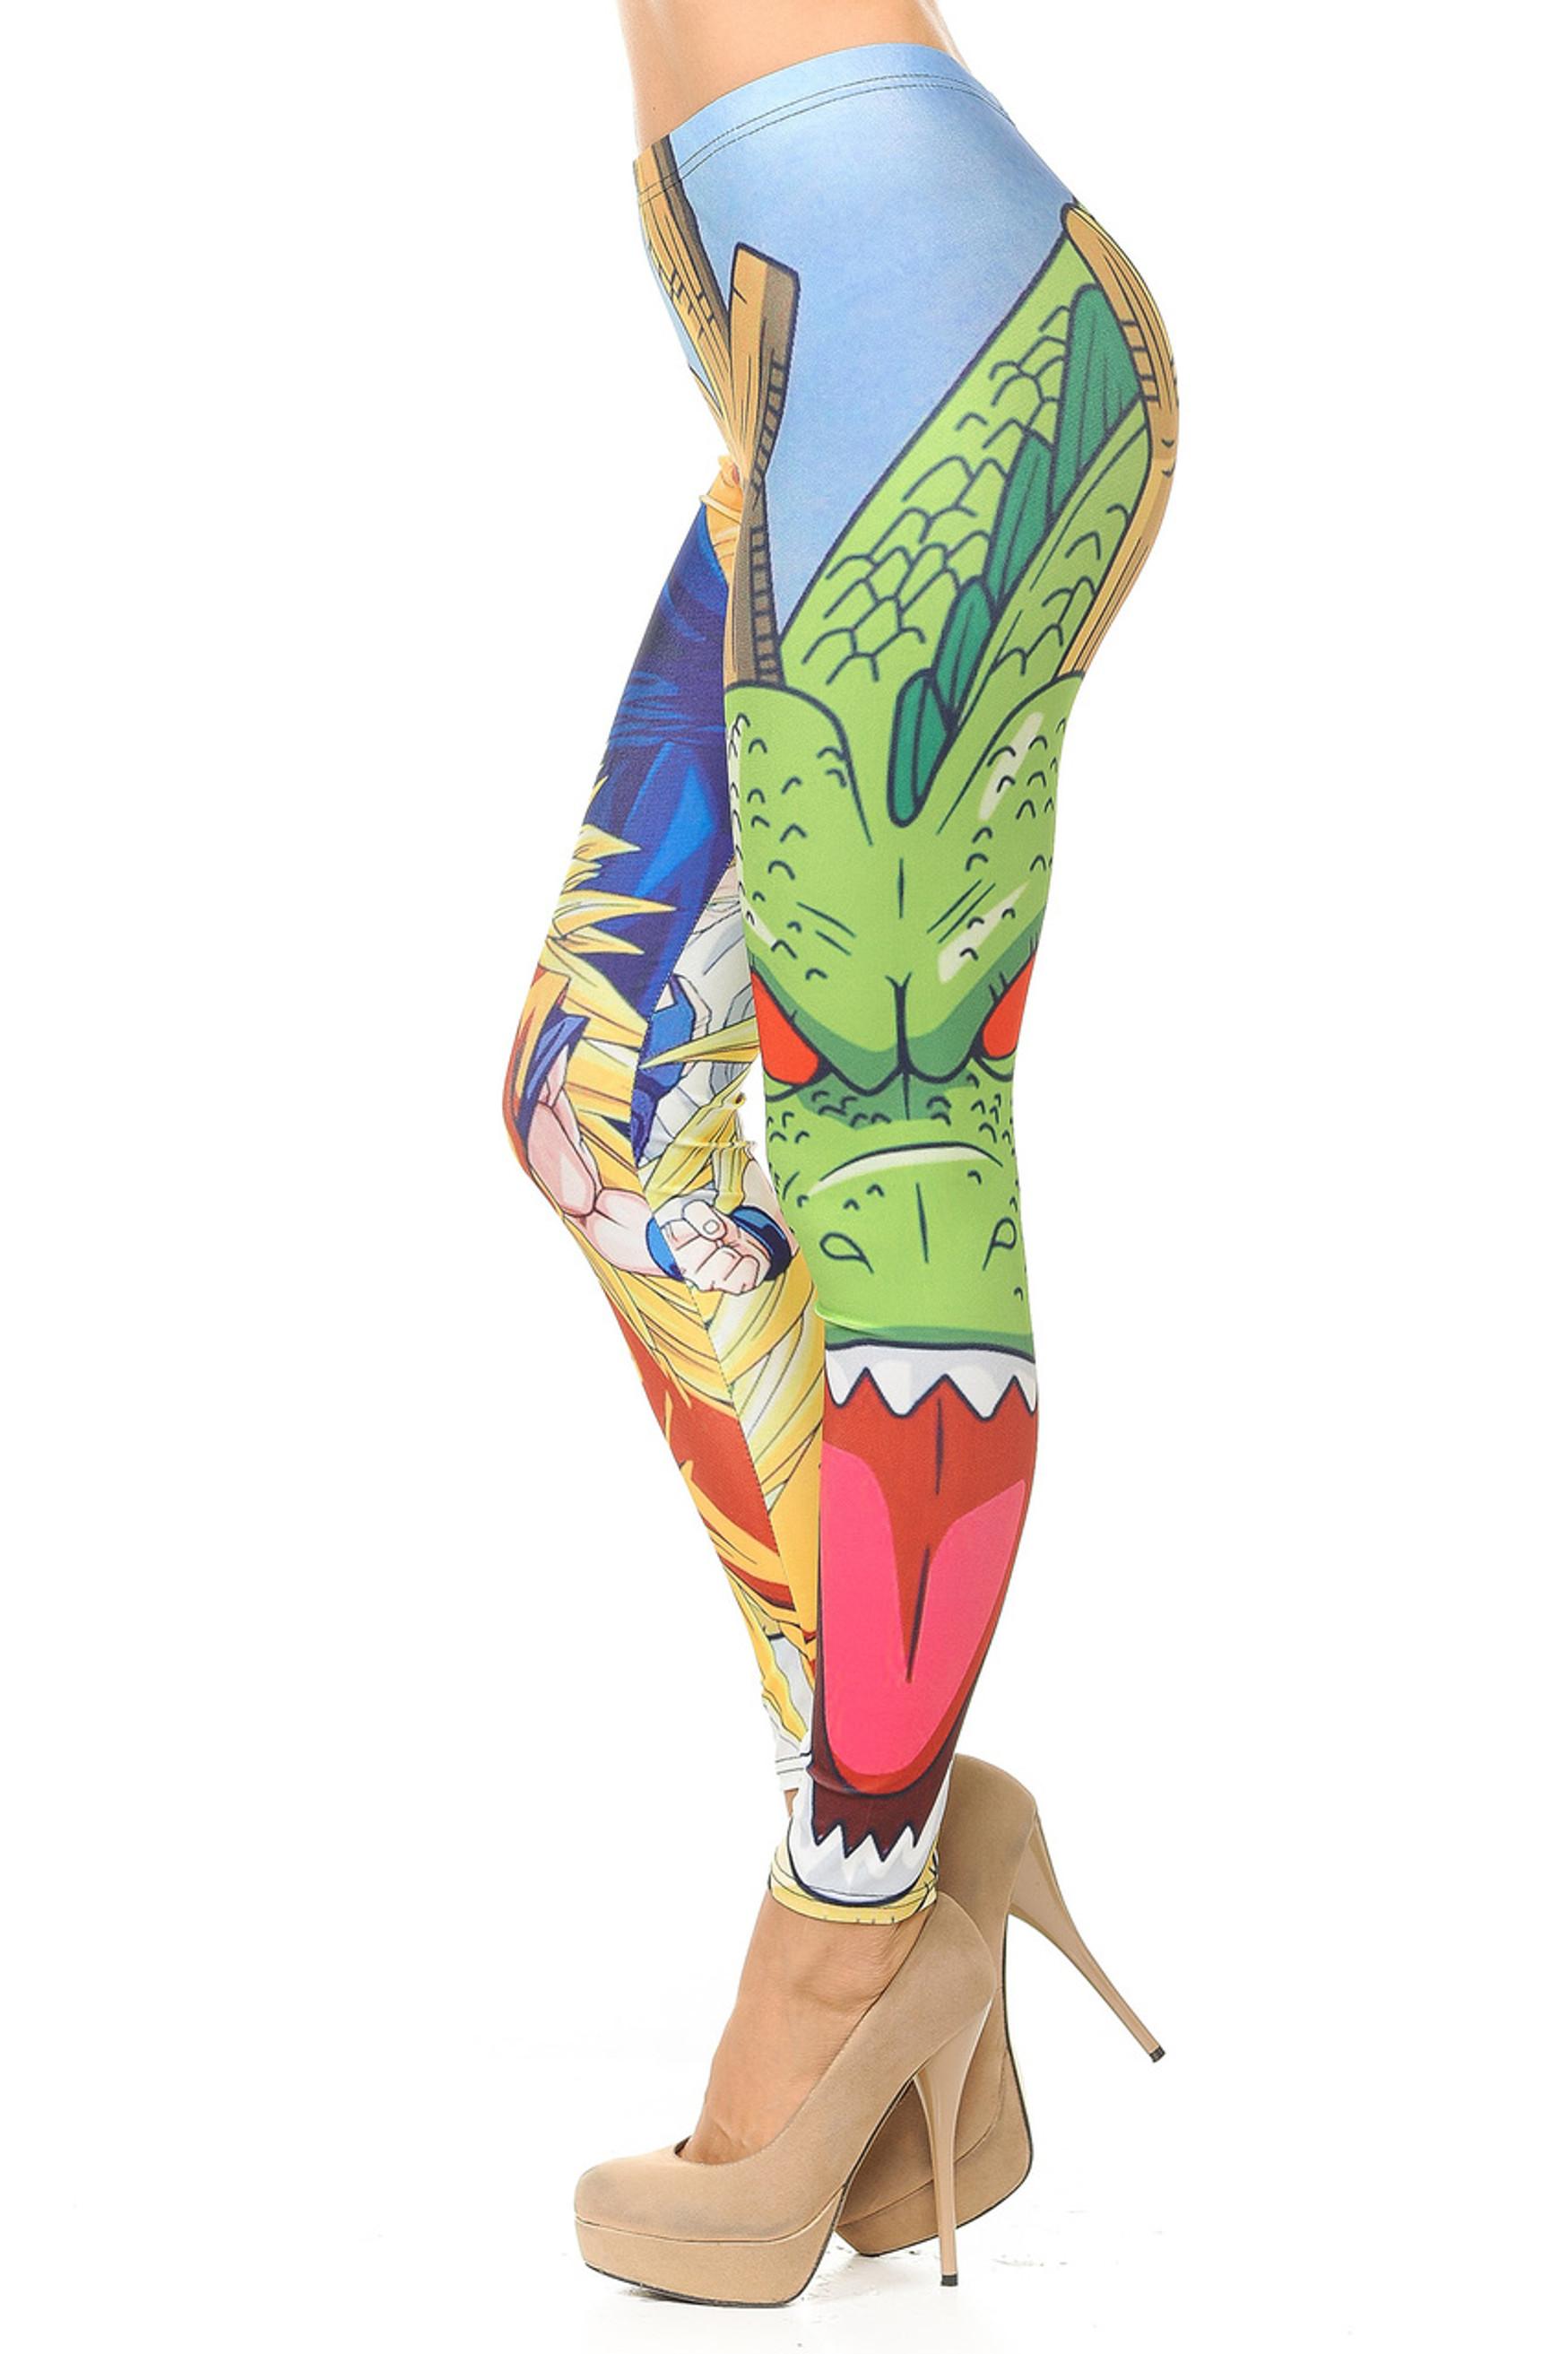 Dragon Ball Z Leggings - Part 2